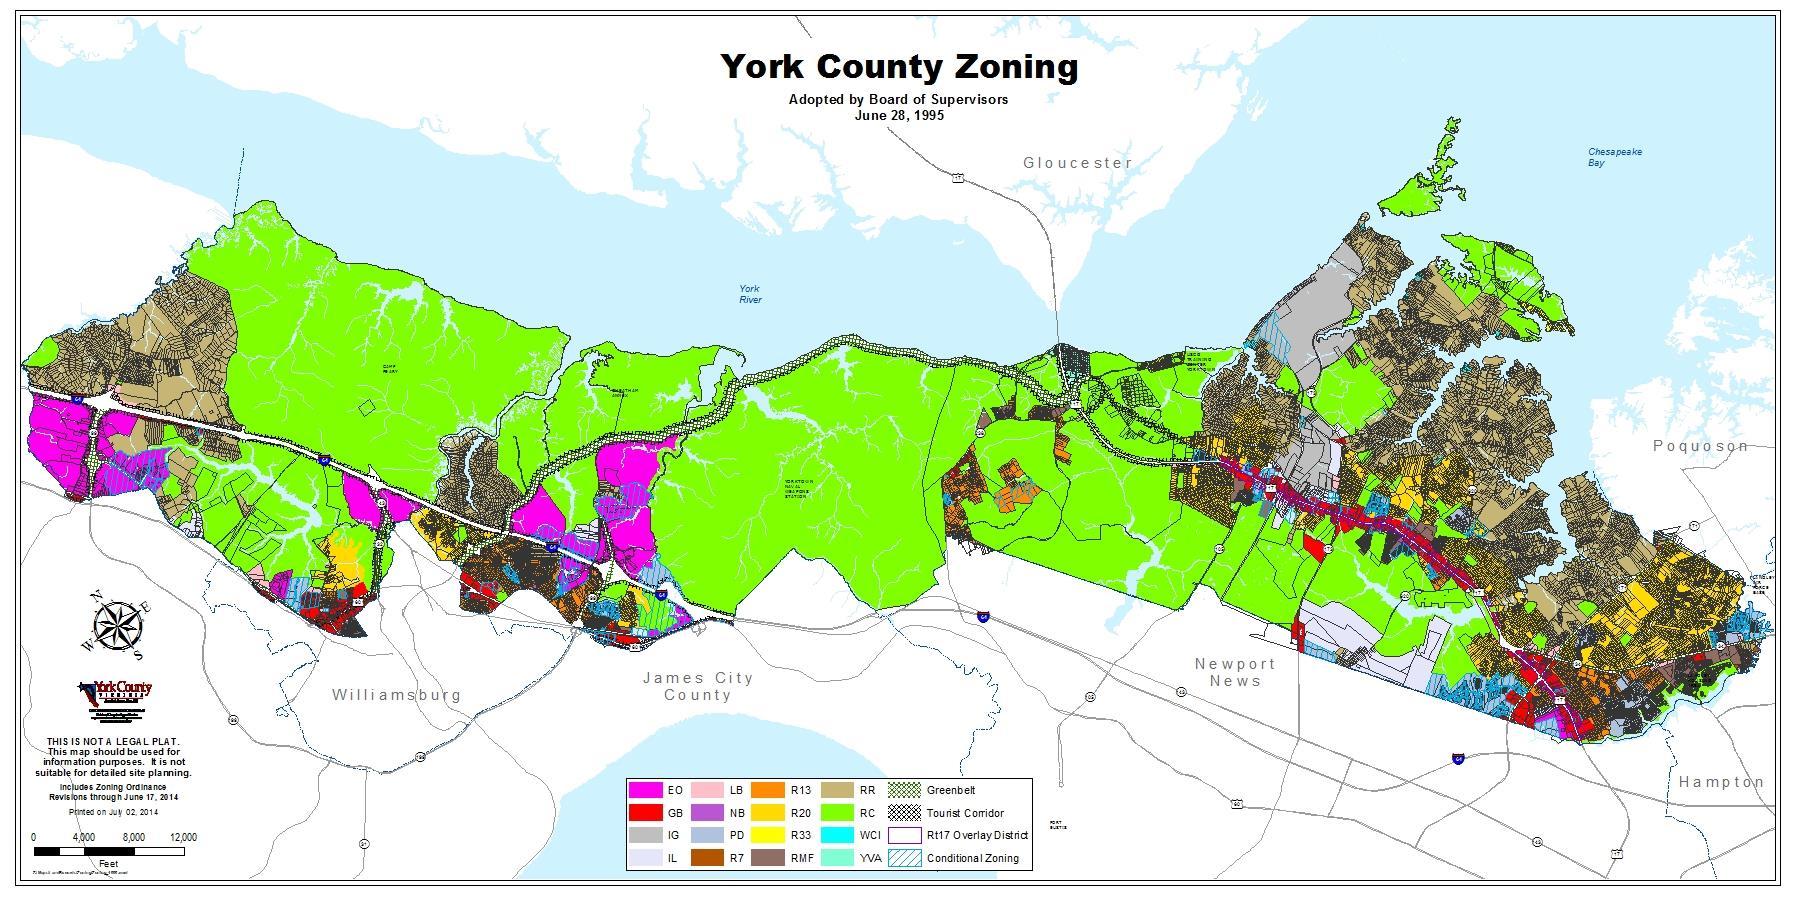 Land Use & Zoning Maps | York County, VA York County Gis Map on county of sacramento california map, county marin san francisco map, gilpin county gis, county of monterey gis,